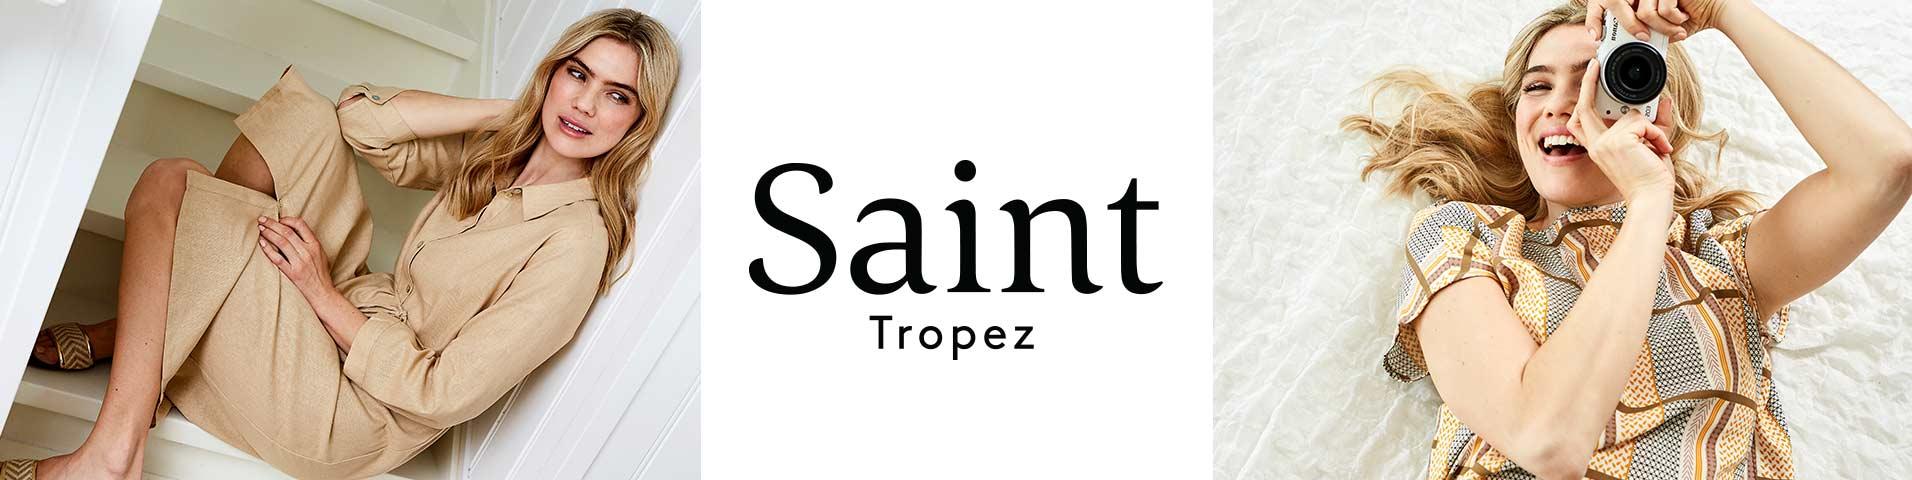 e6bcd11dfba Saint Tropez online | Den nye kollektion på Zalando